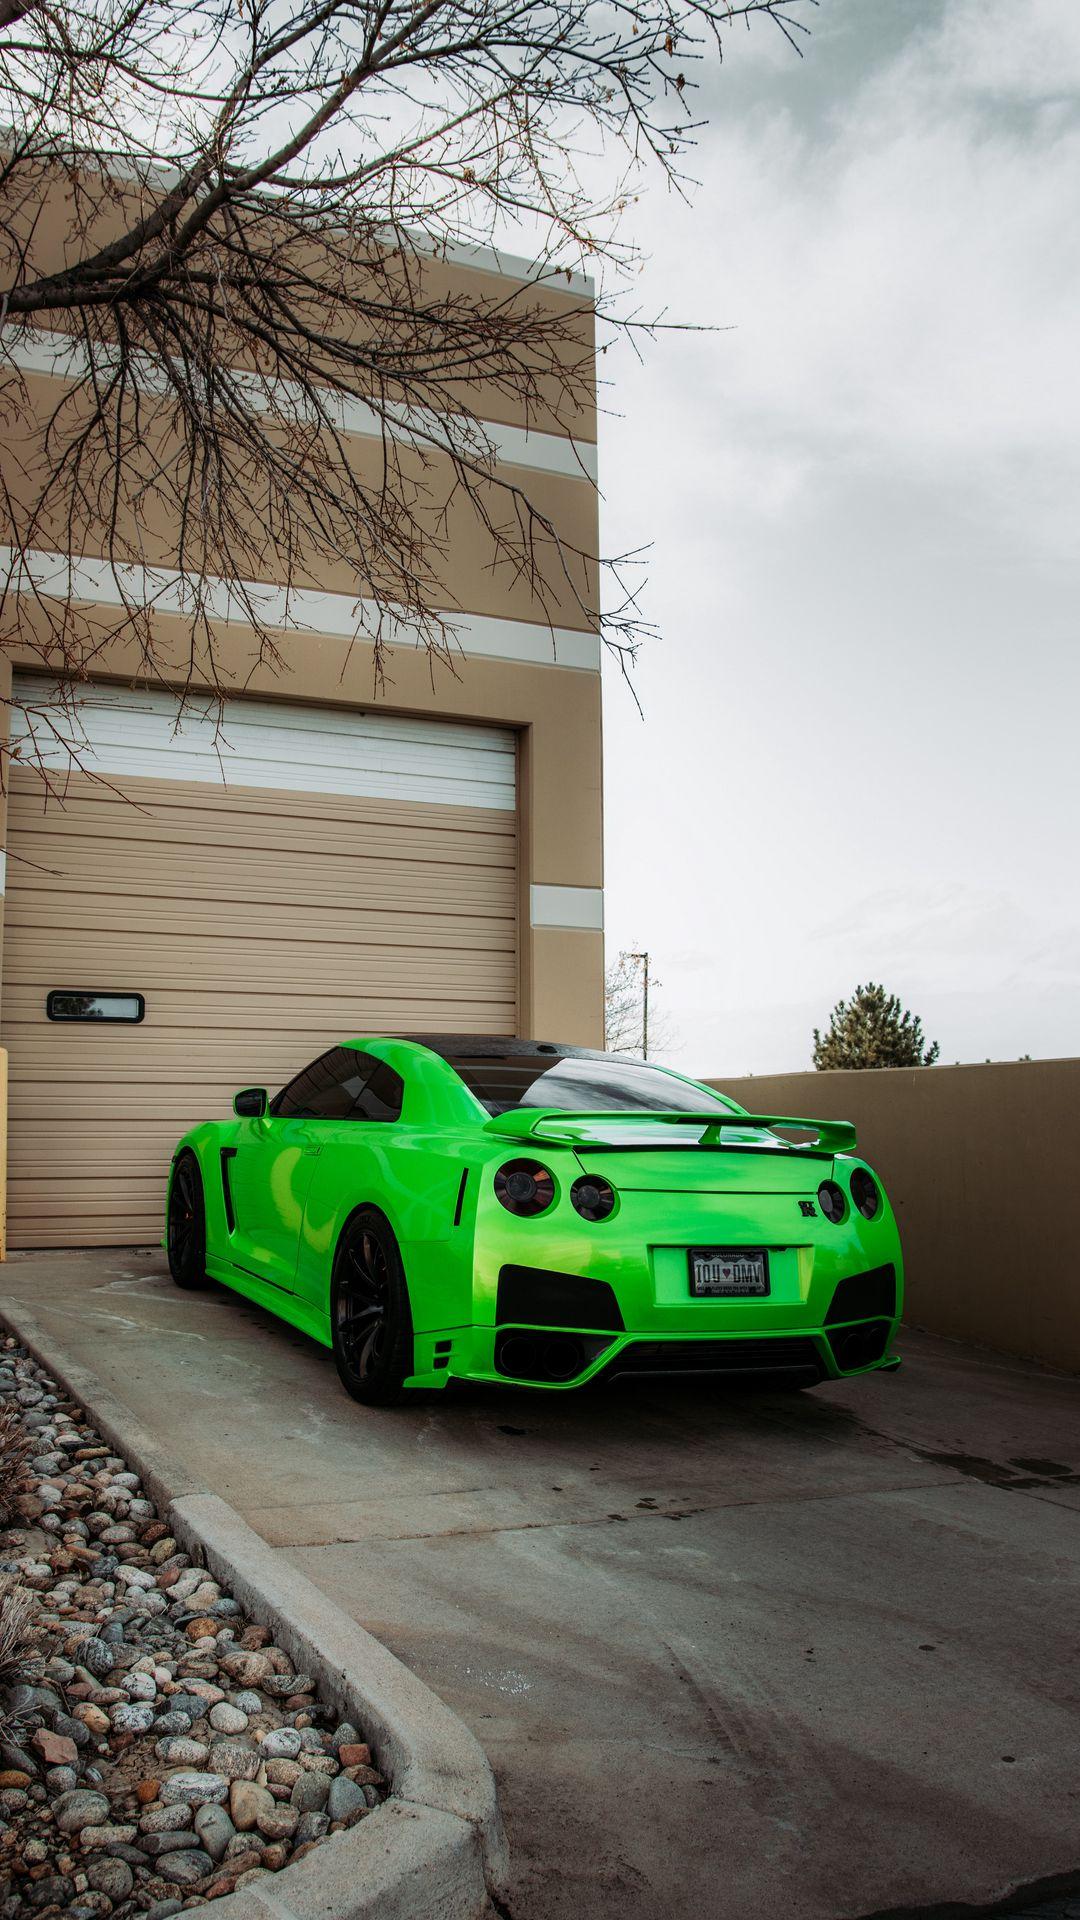 4K Nissan Gtr Sports Car Wallpapers Download